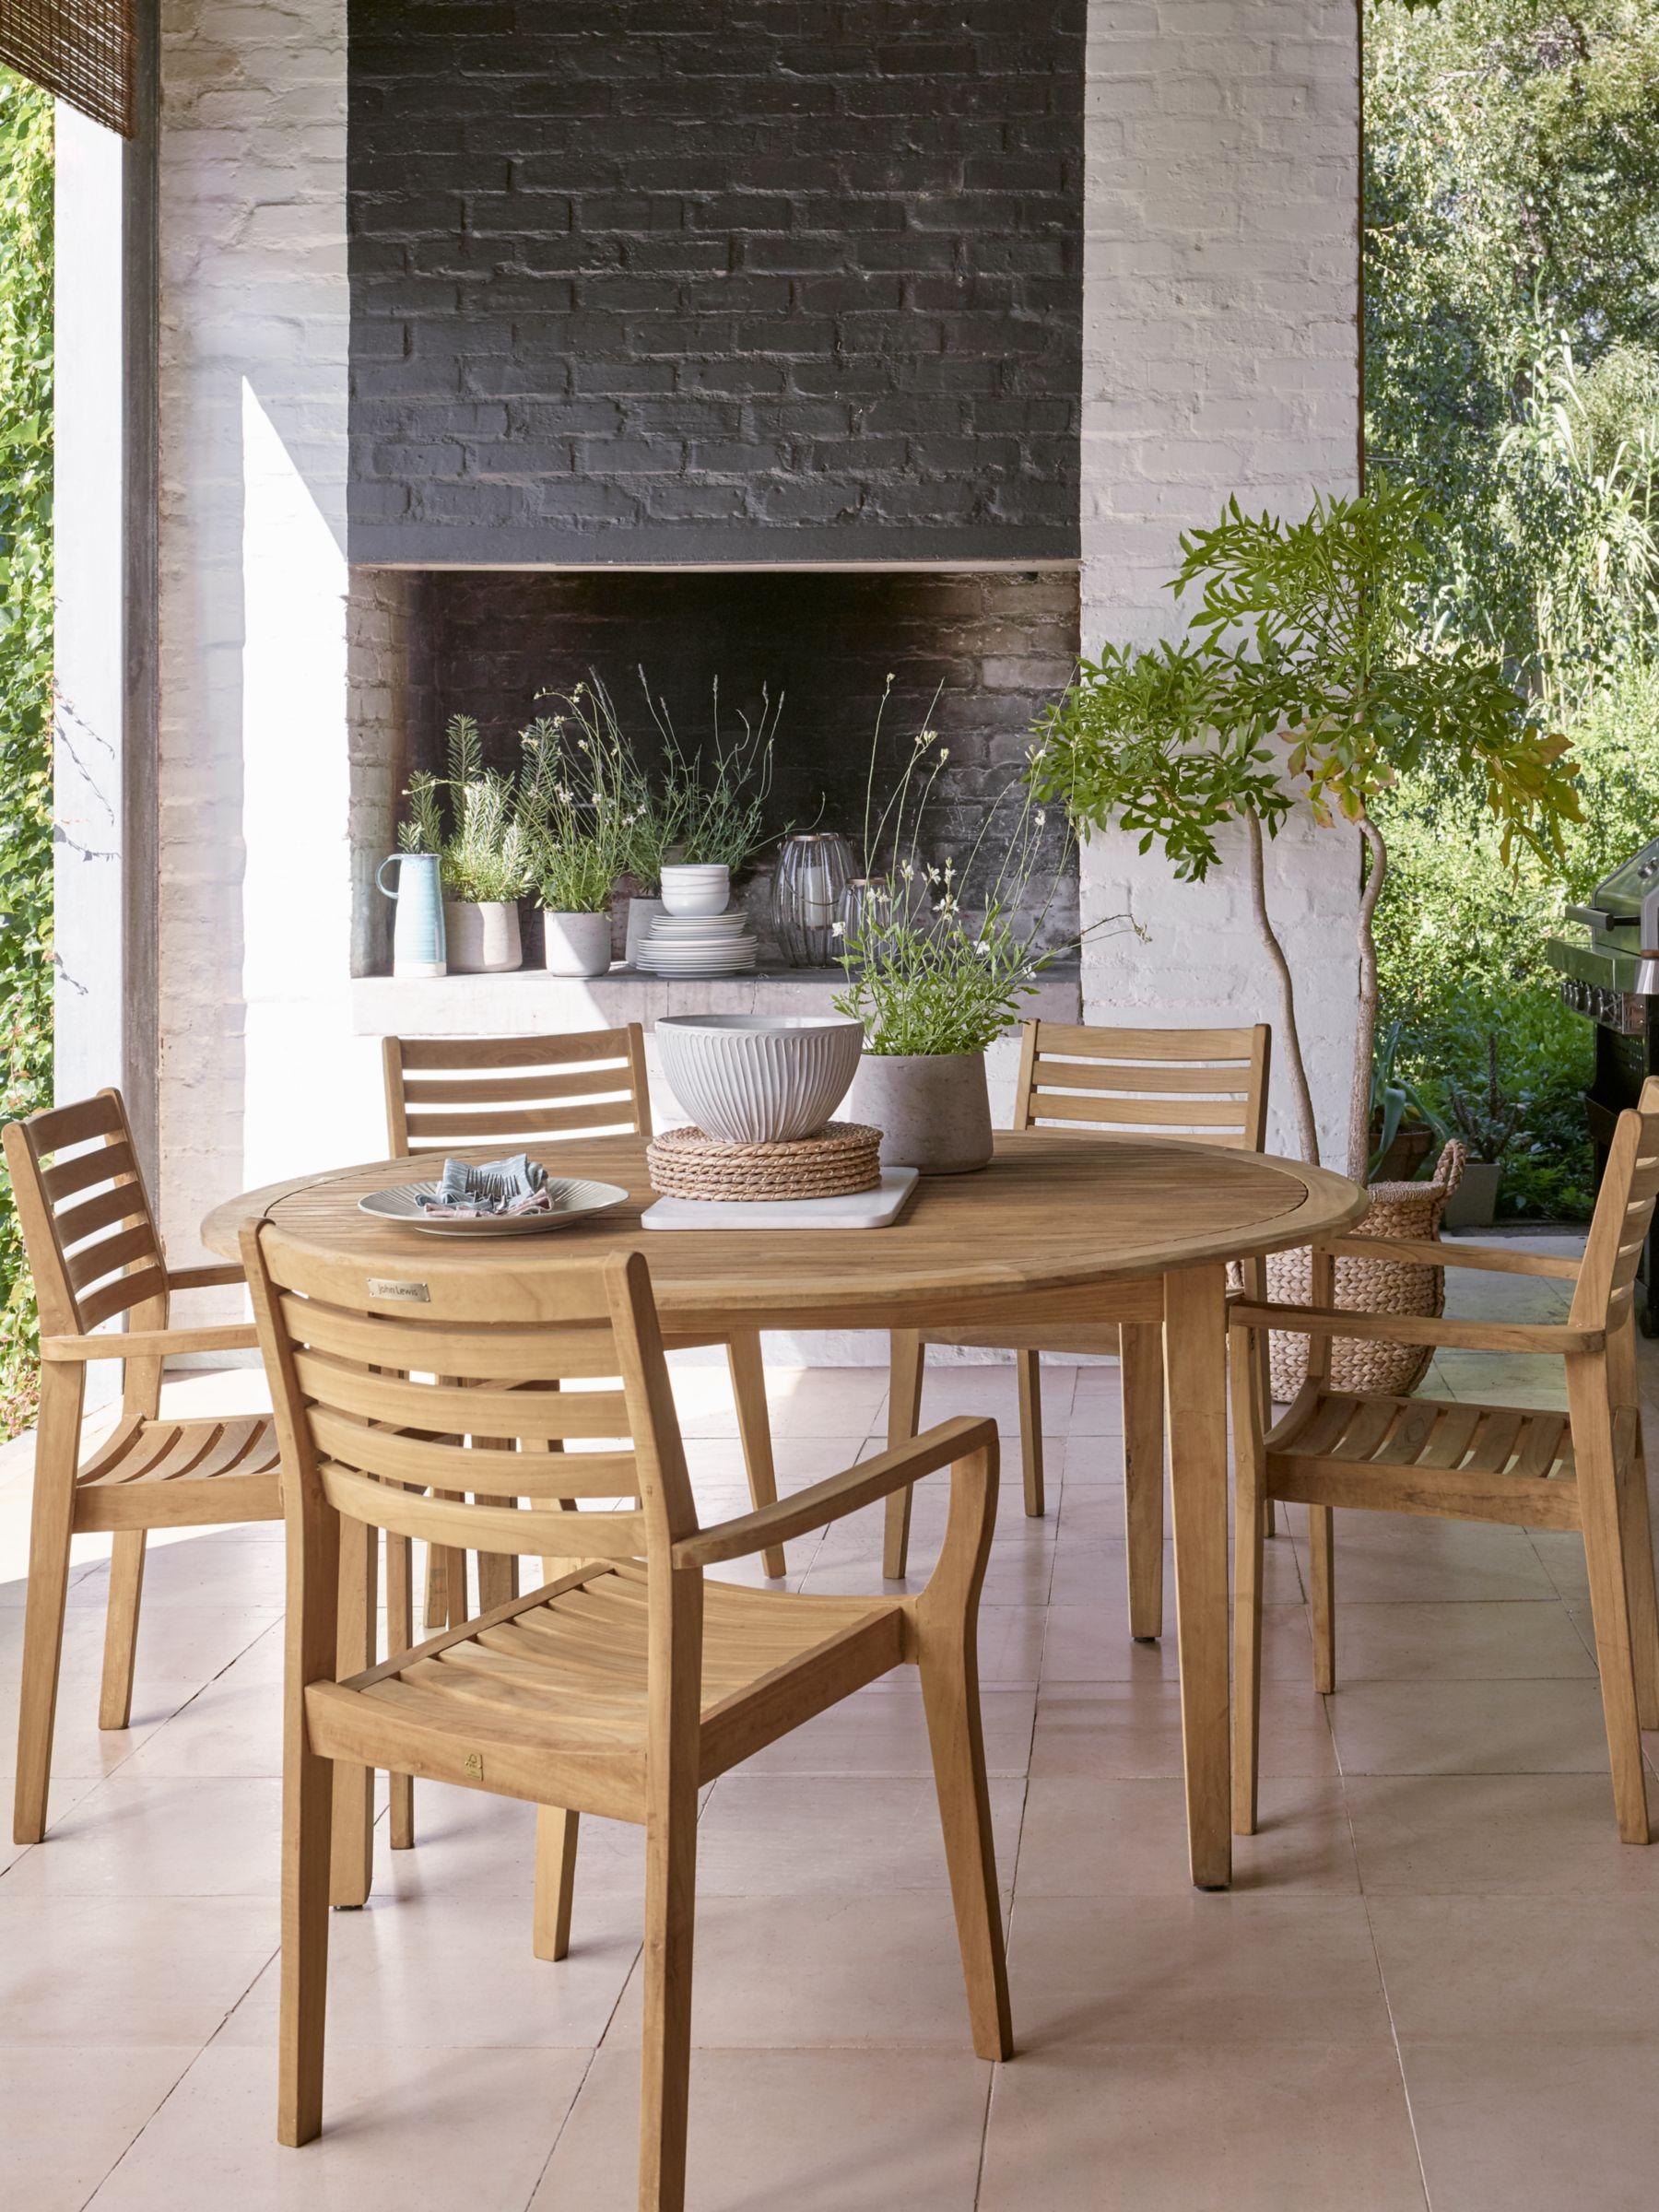 John Lewis Longstock Garden Dining Table 6 Stacking Chairs